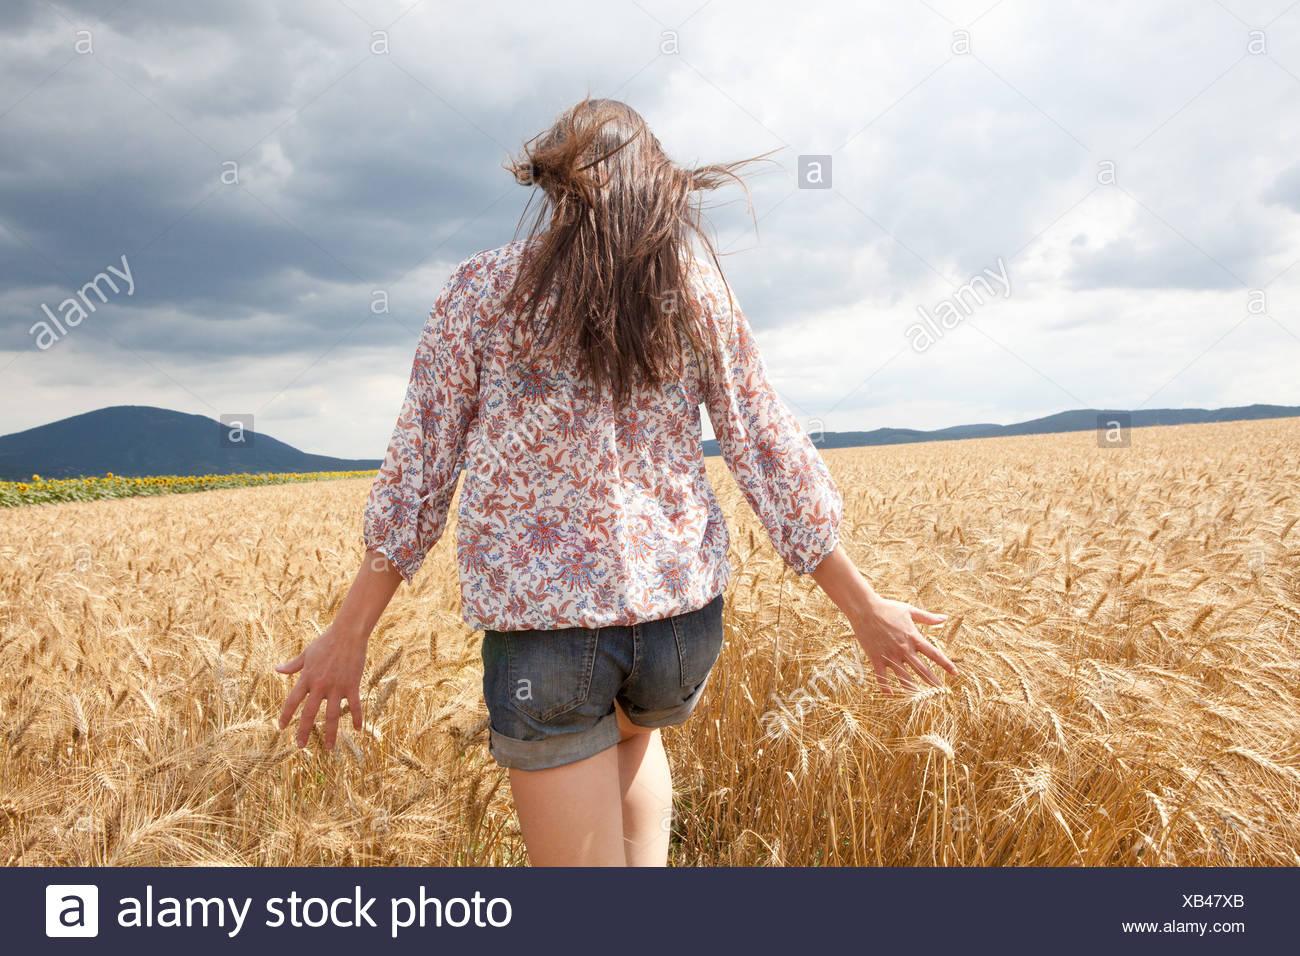 Mid adult woman walking through field Photo Stock